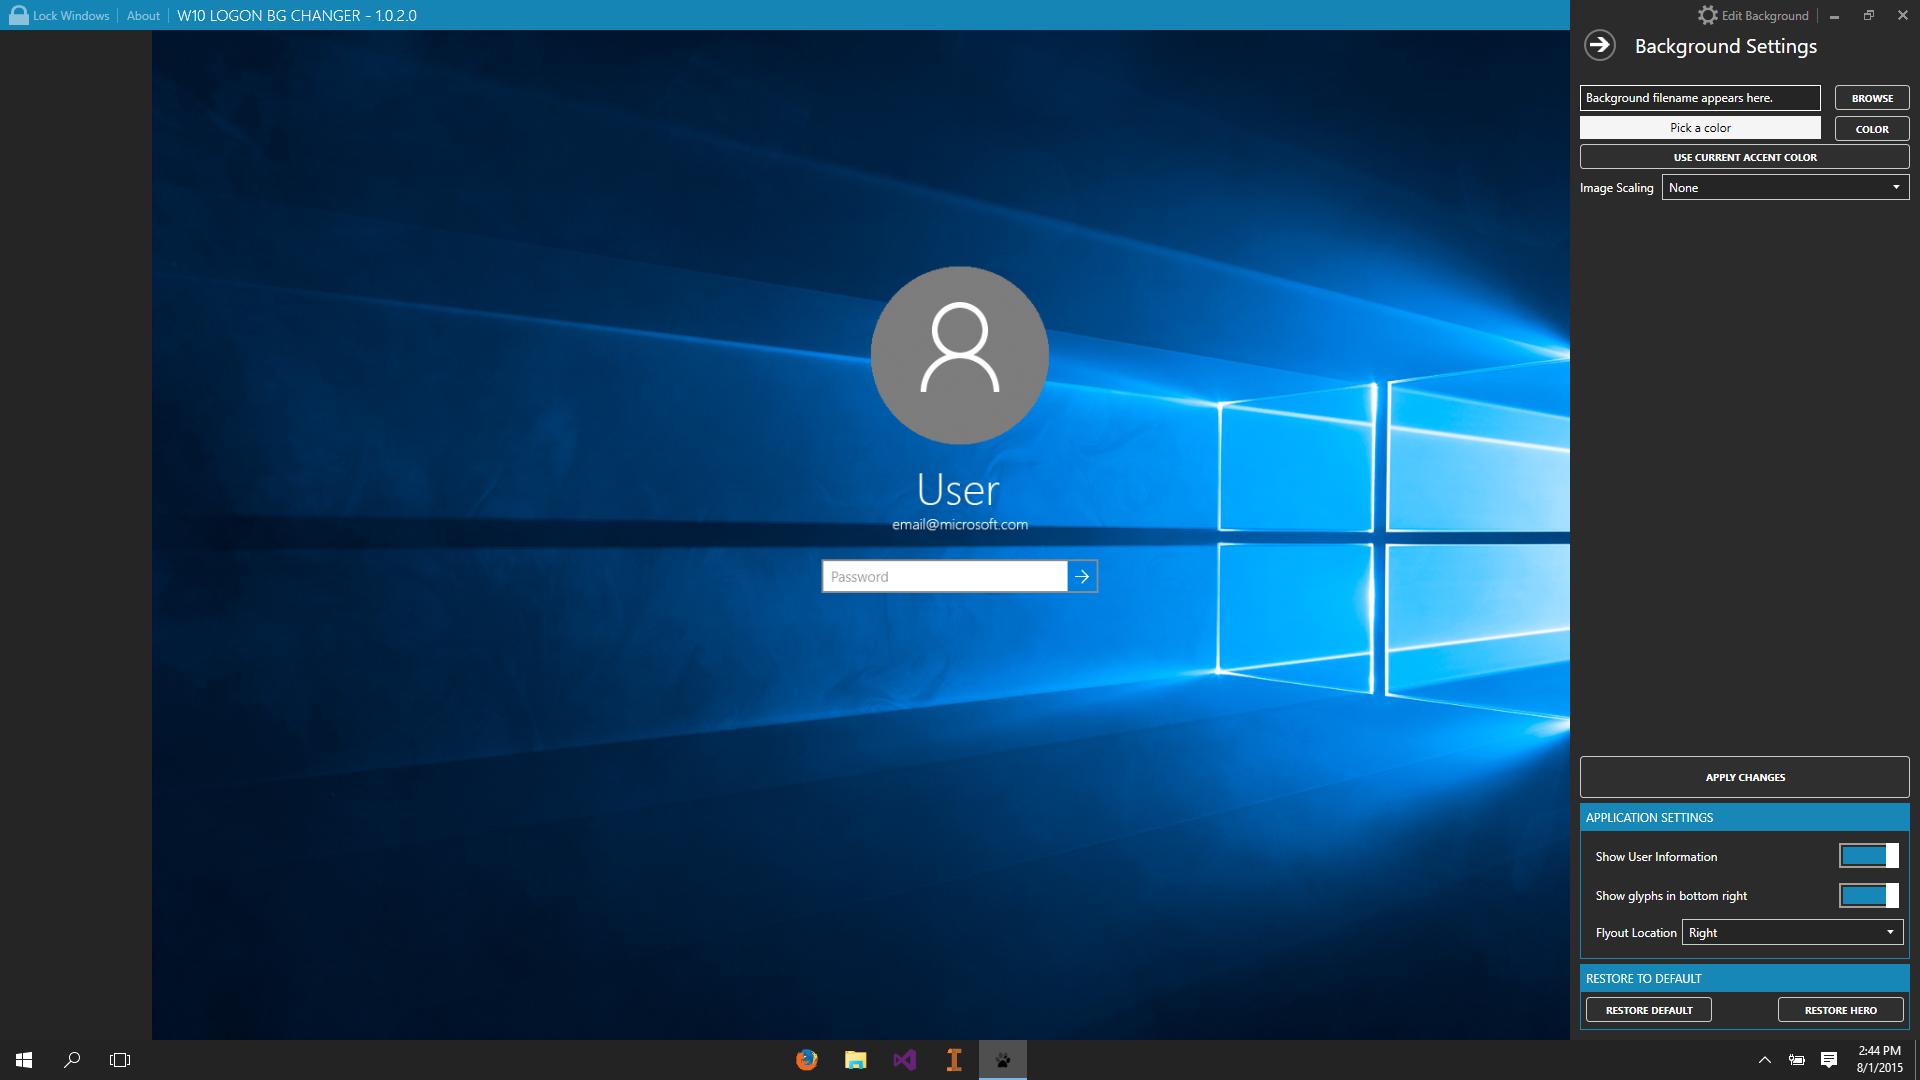 How to change lock screen for windows 10 - Novaspirit